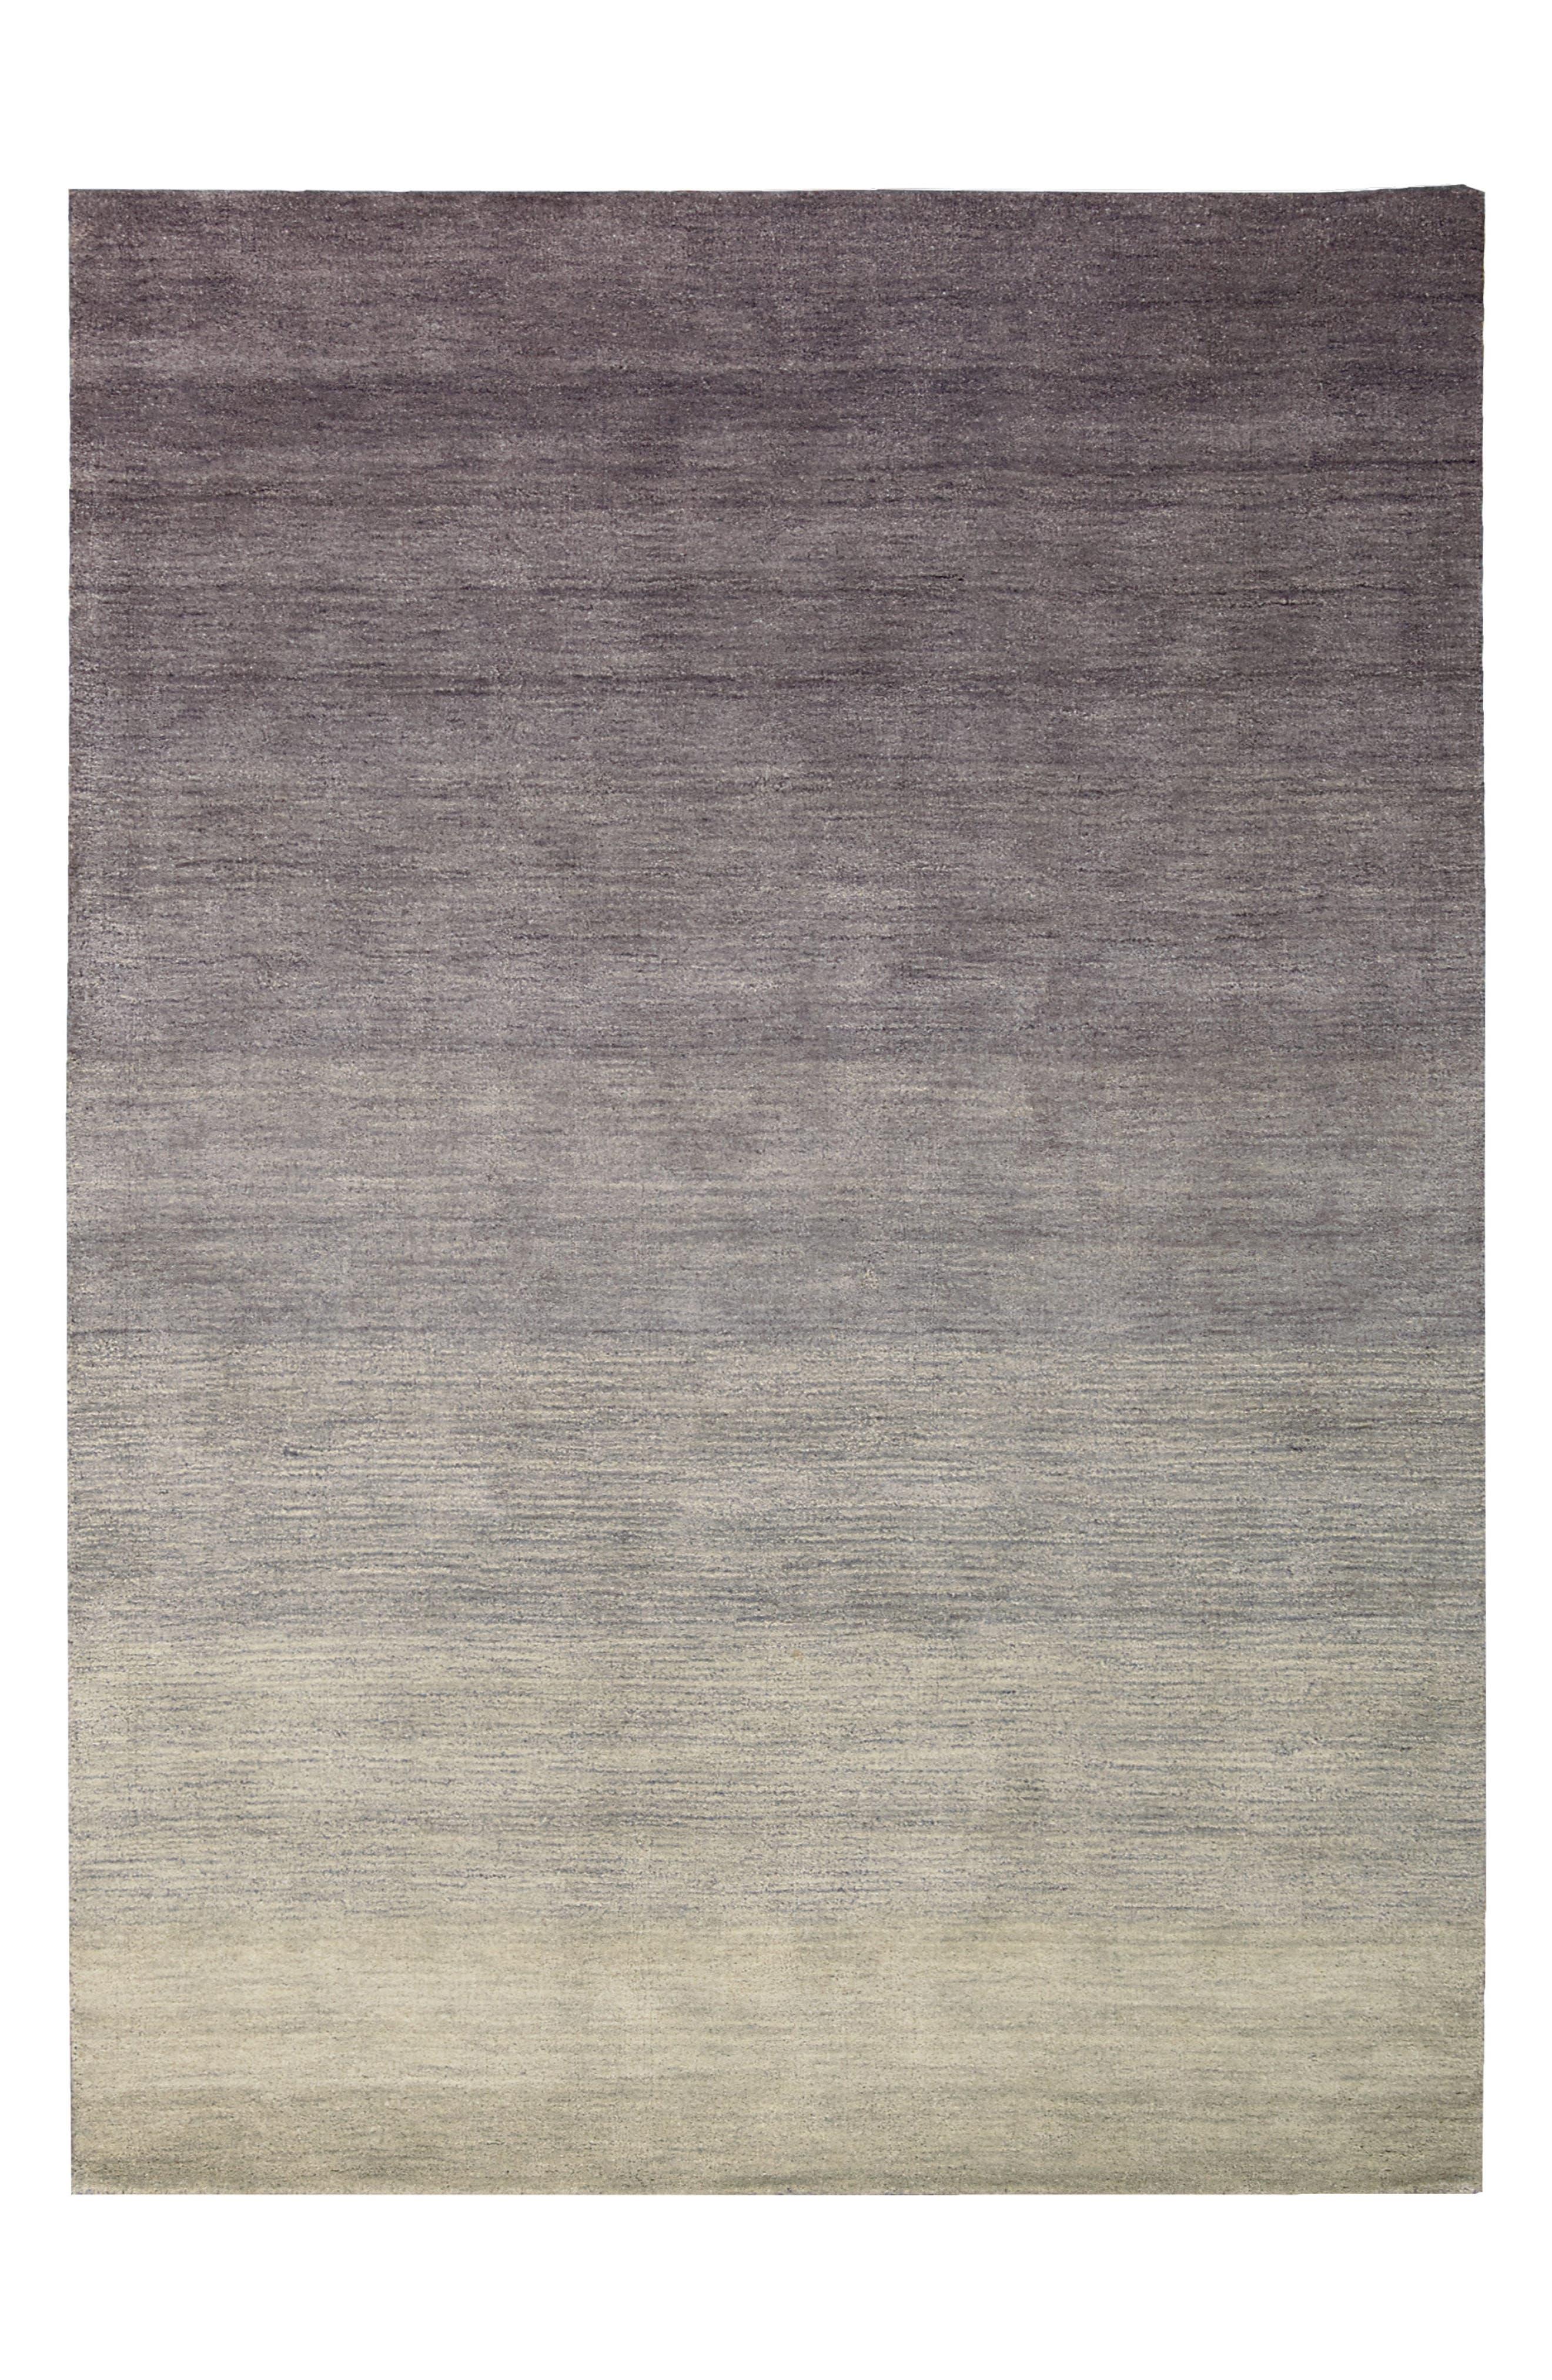 Haze Smoke Wool Area Rug,                             Alternate thumbnail 4, color,                             030